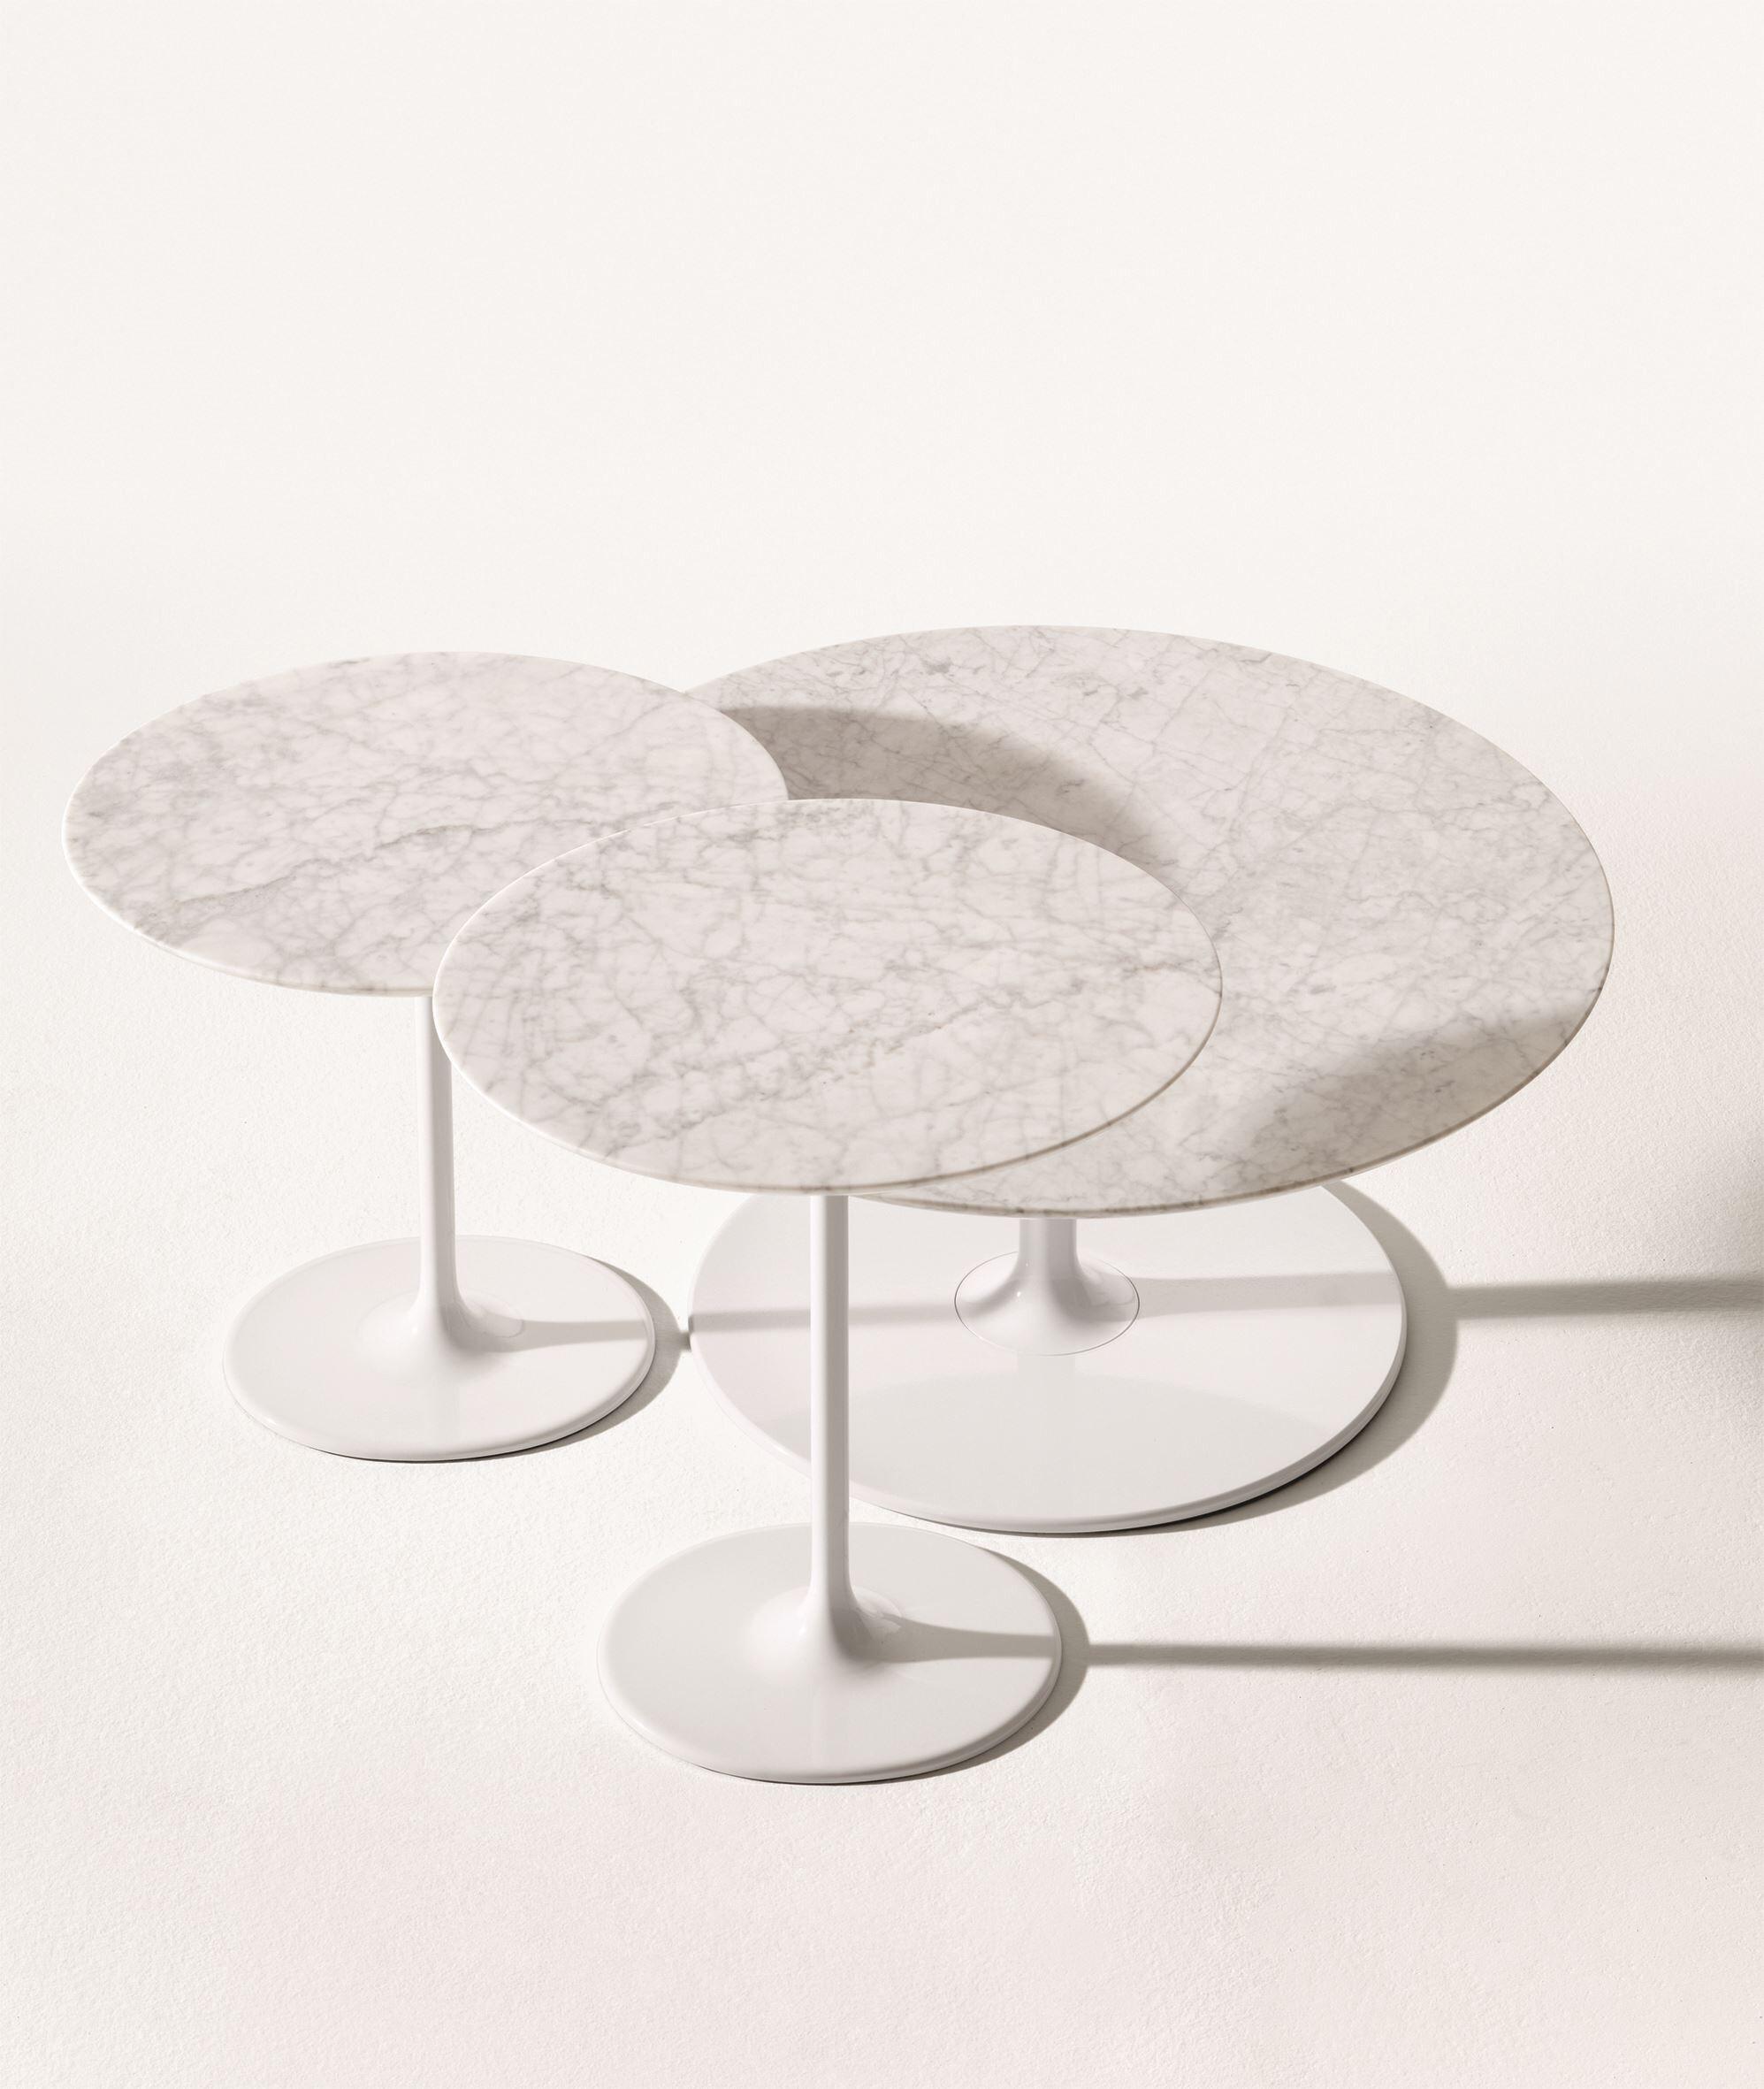 Dizzie: Marble top